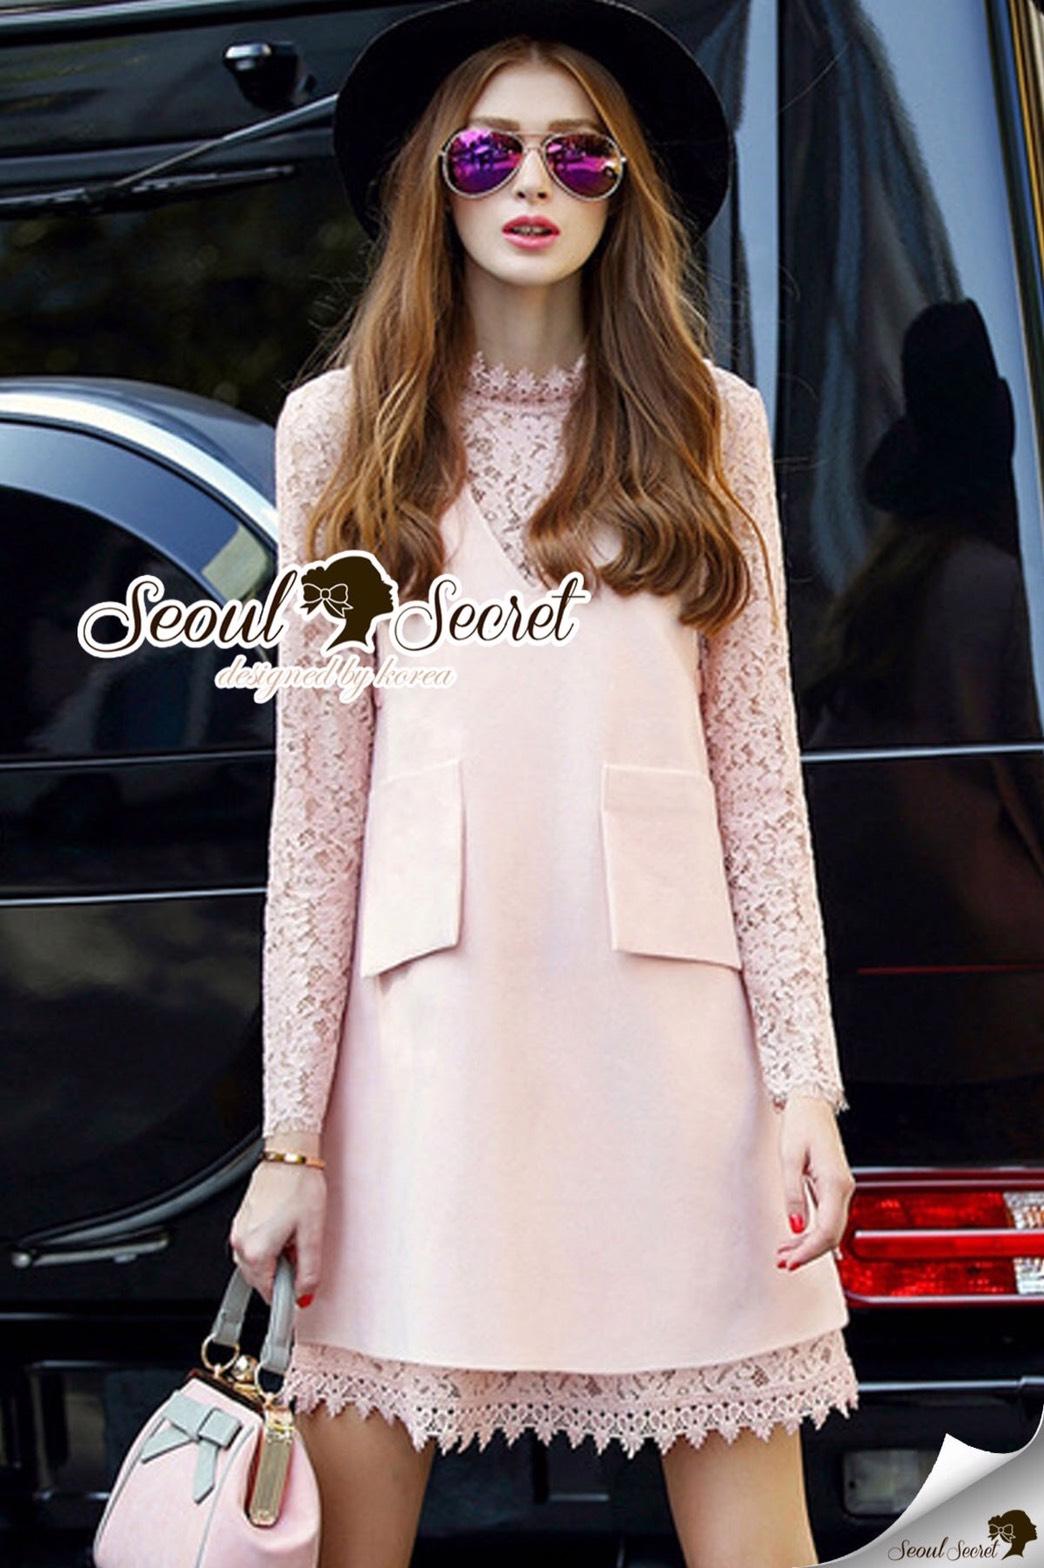 Seoul Secret Say's... Pastel Salmon Pink Girly Dress Outer Set